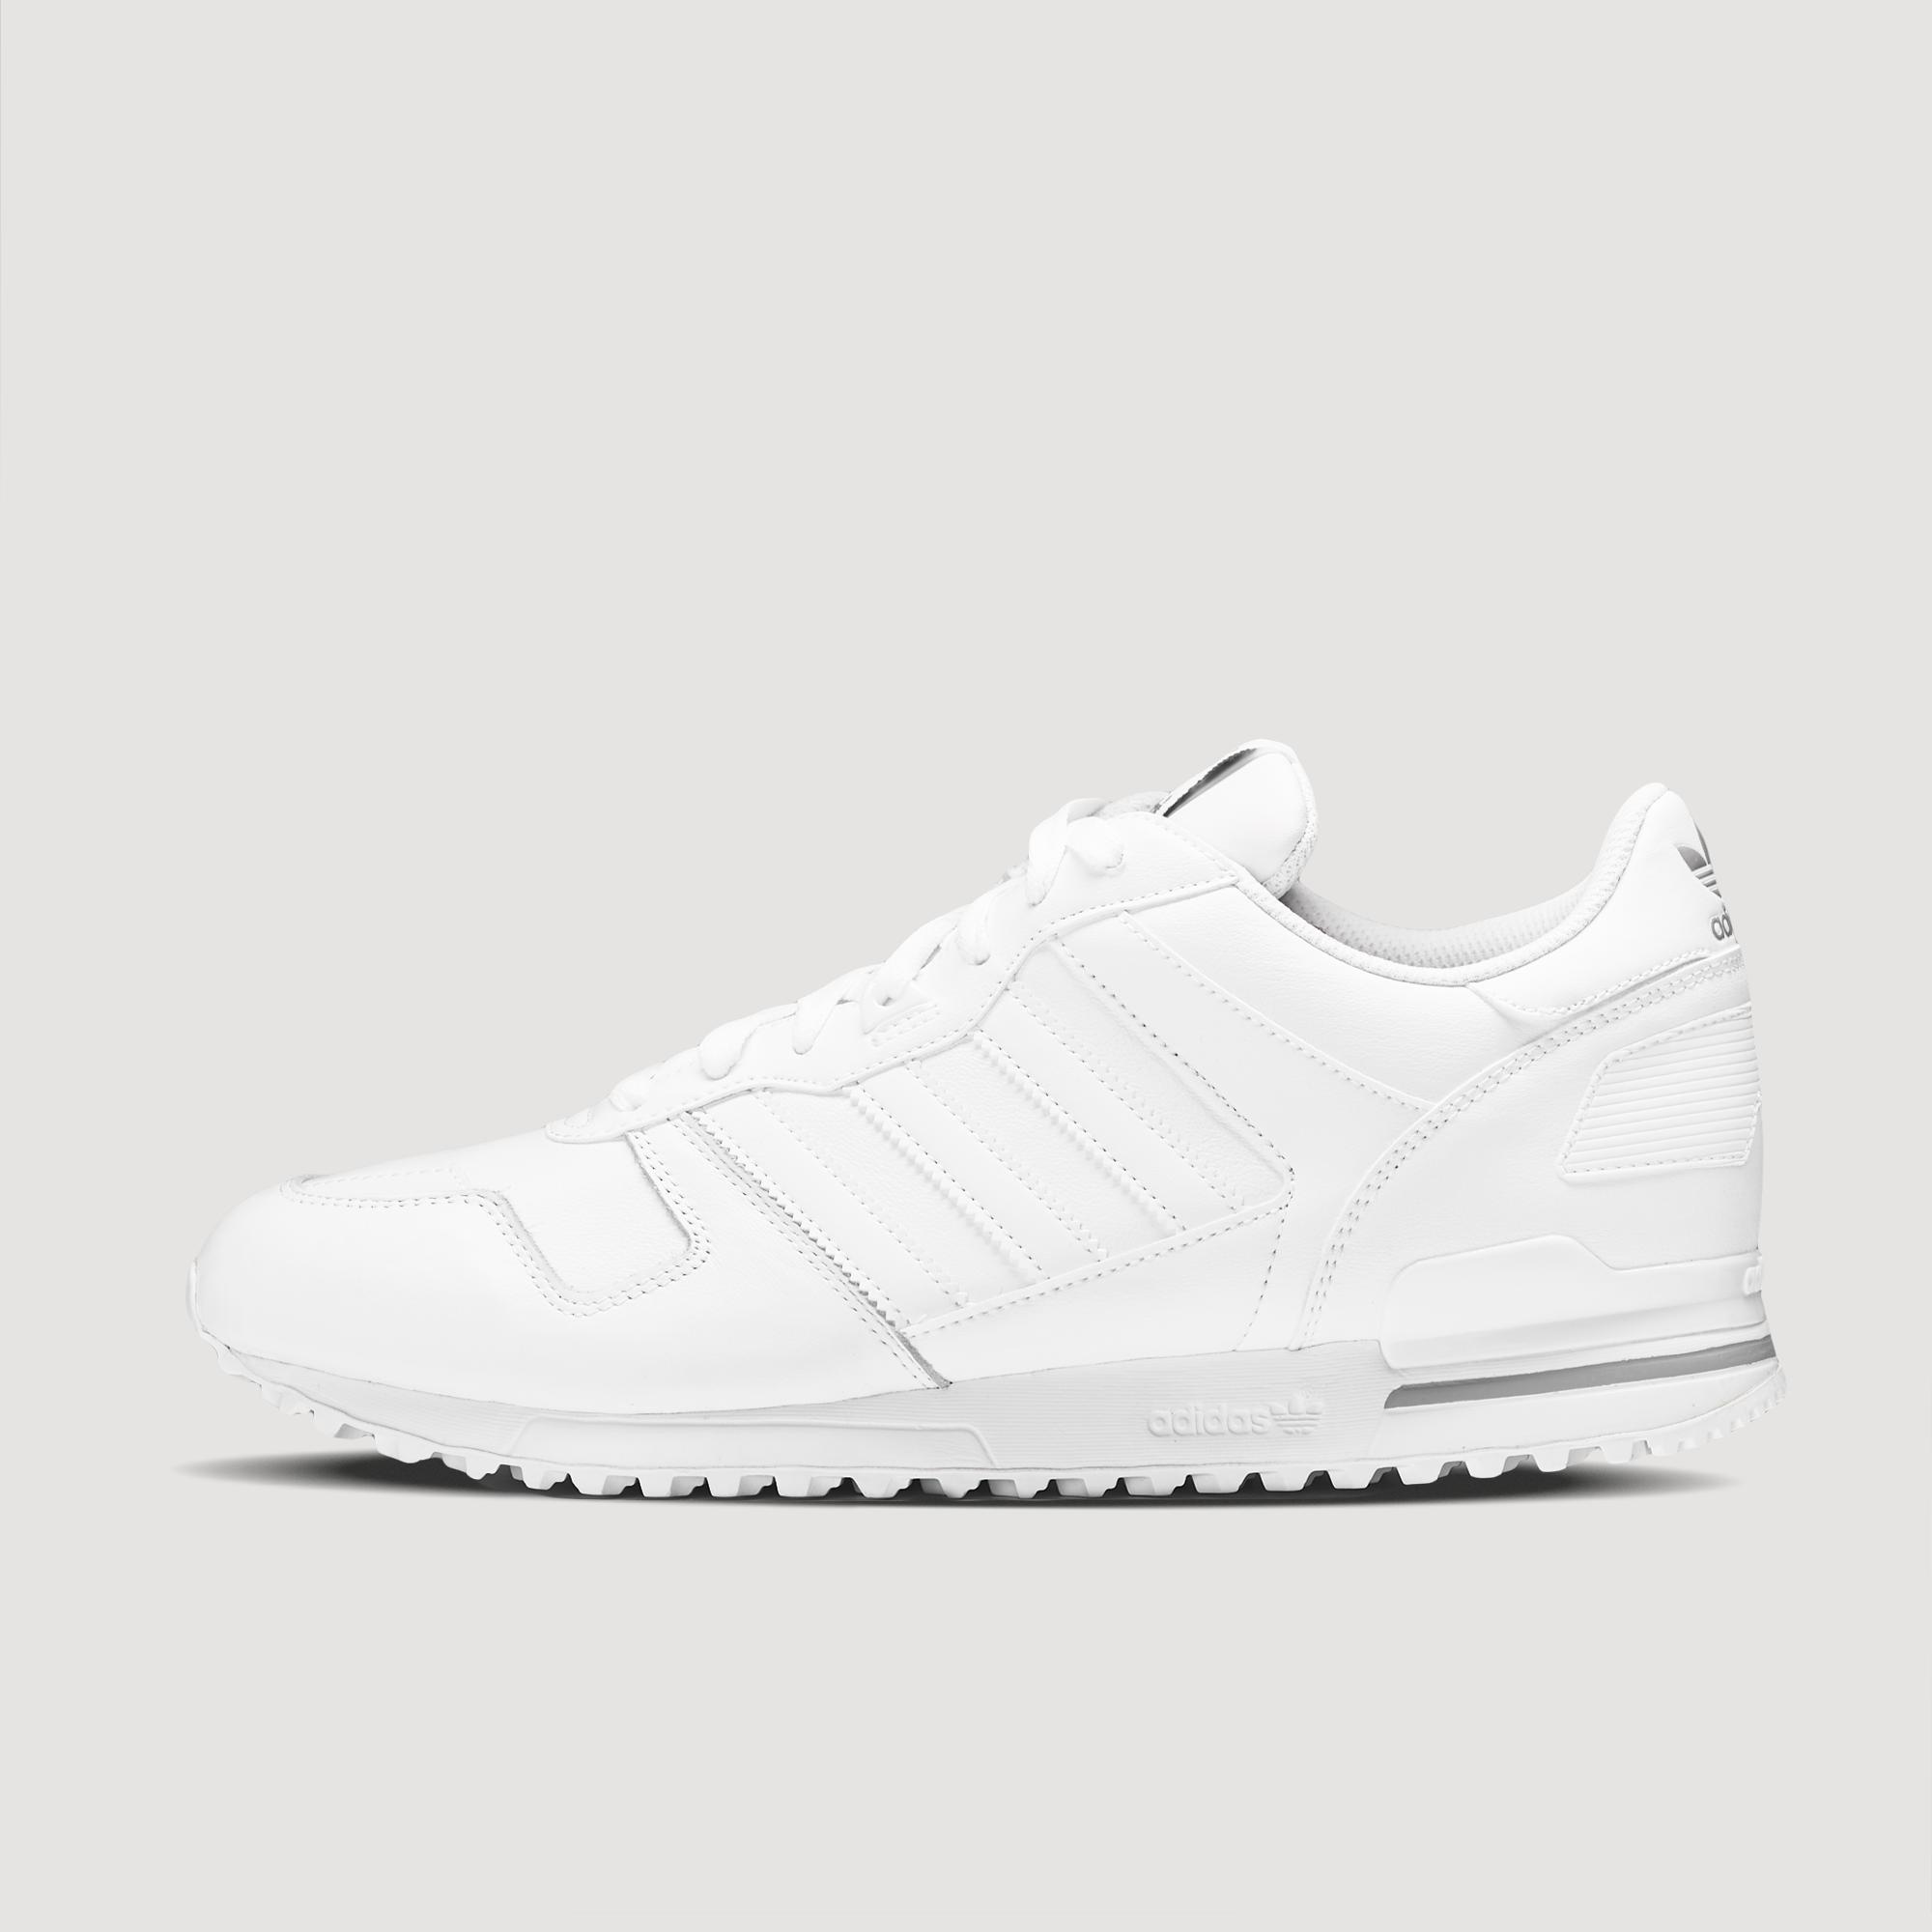 Cipők adidas Zx 700 S76174 CblackFtwwhtCblack Sneakers